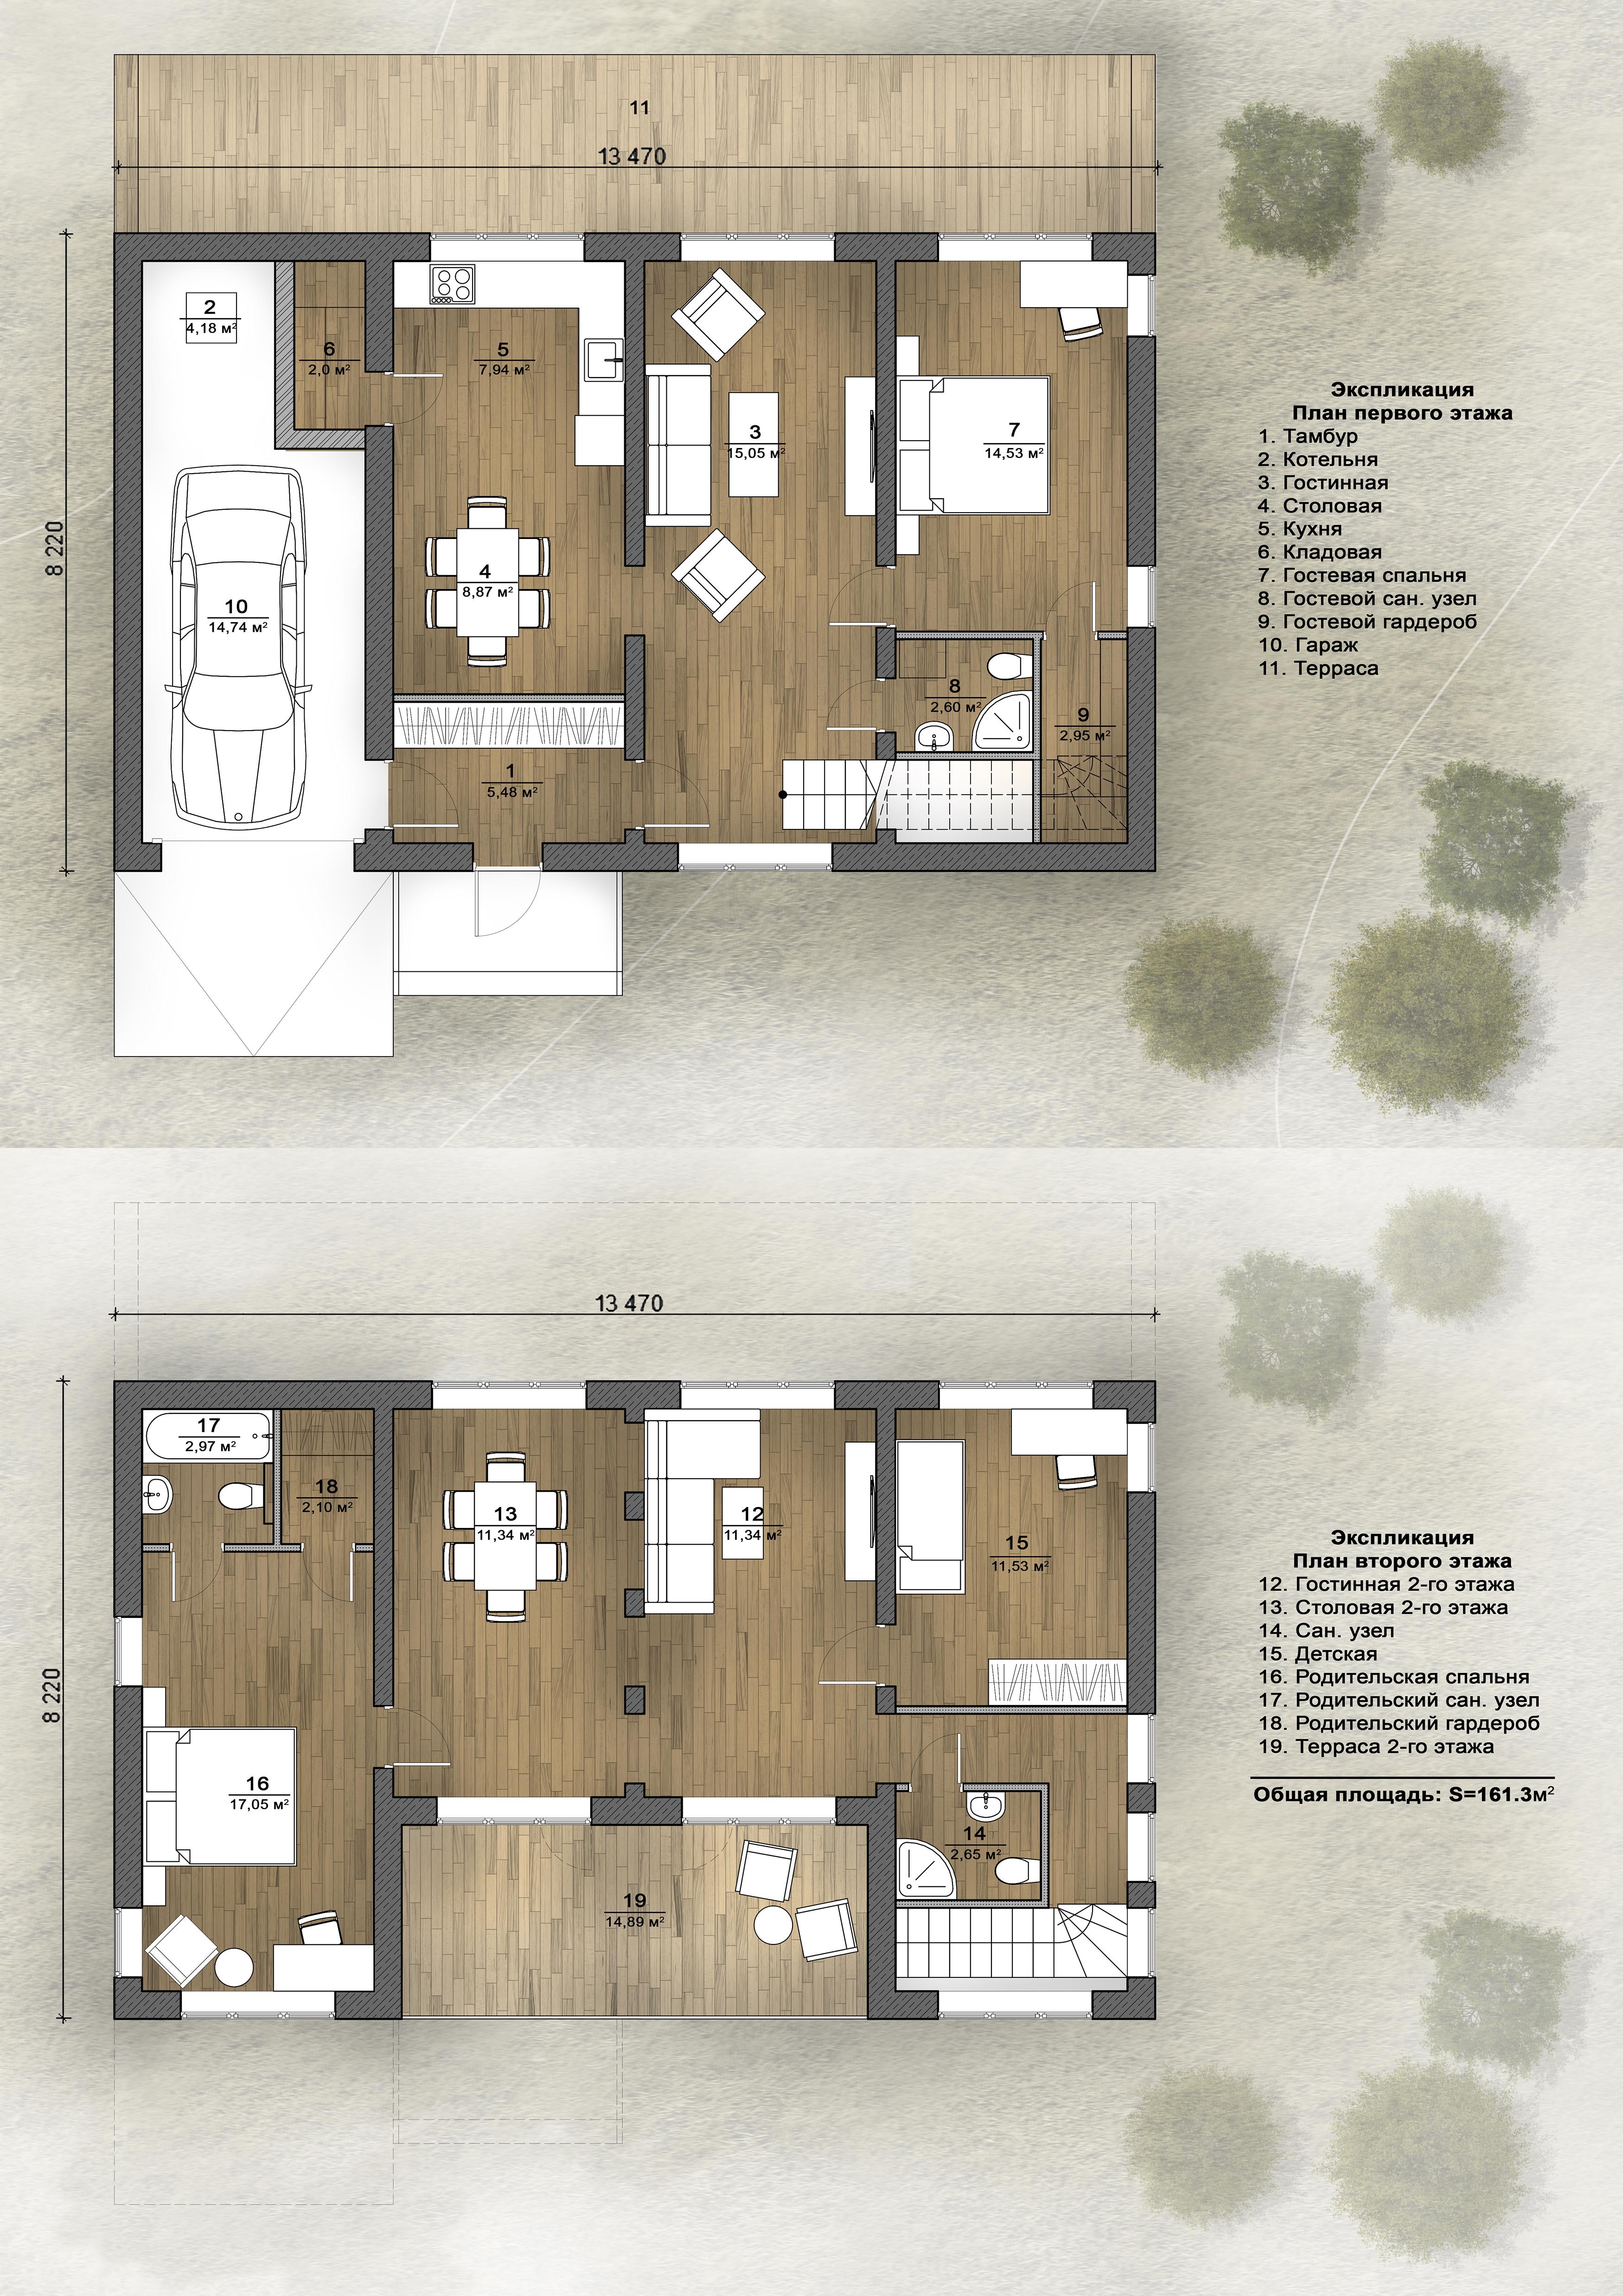 Экспликация помещений дома на 180м2